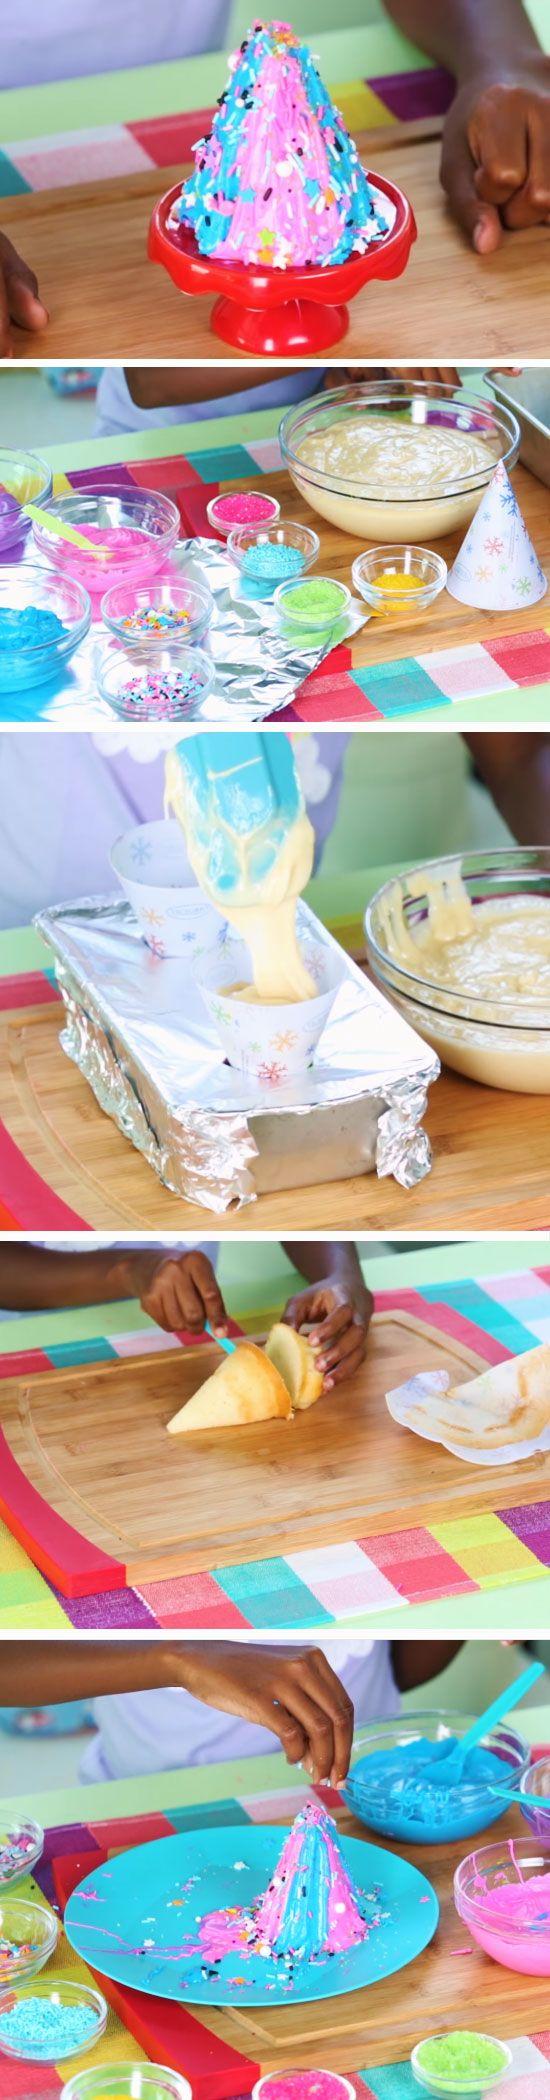 Edible Unicorn Horn Easy Birthday Party Food Ideas For Kids Diy